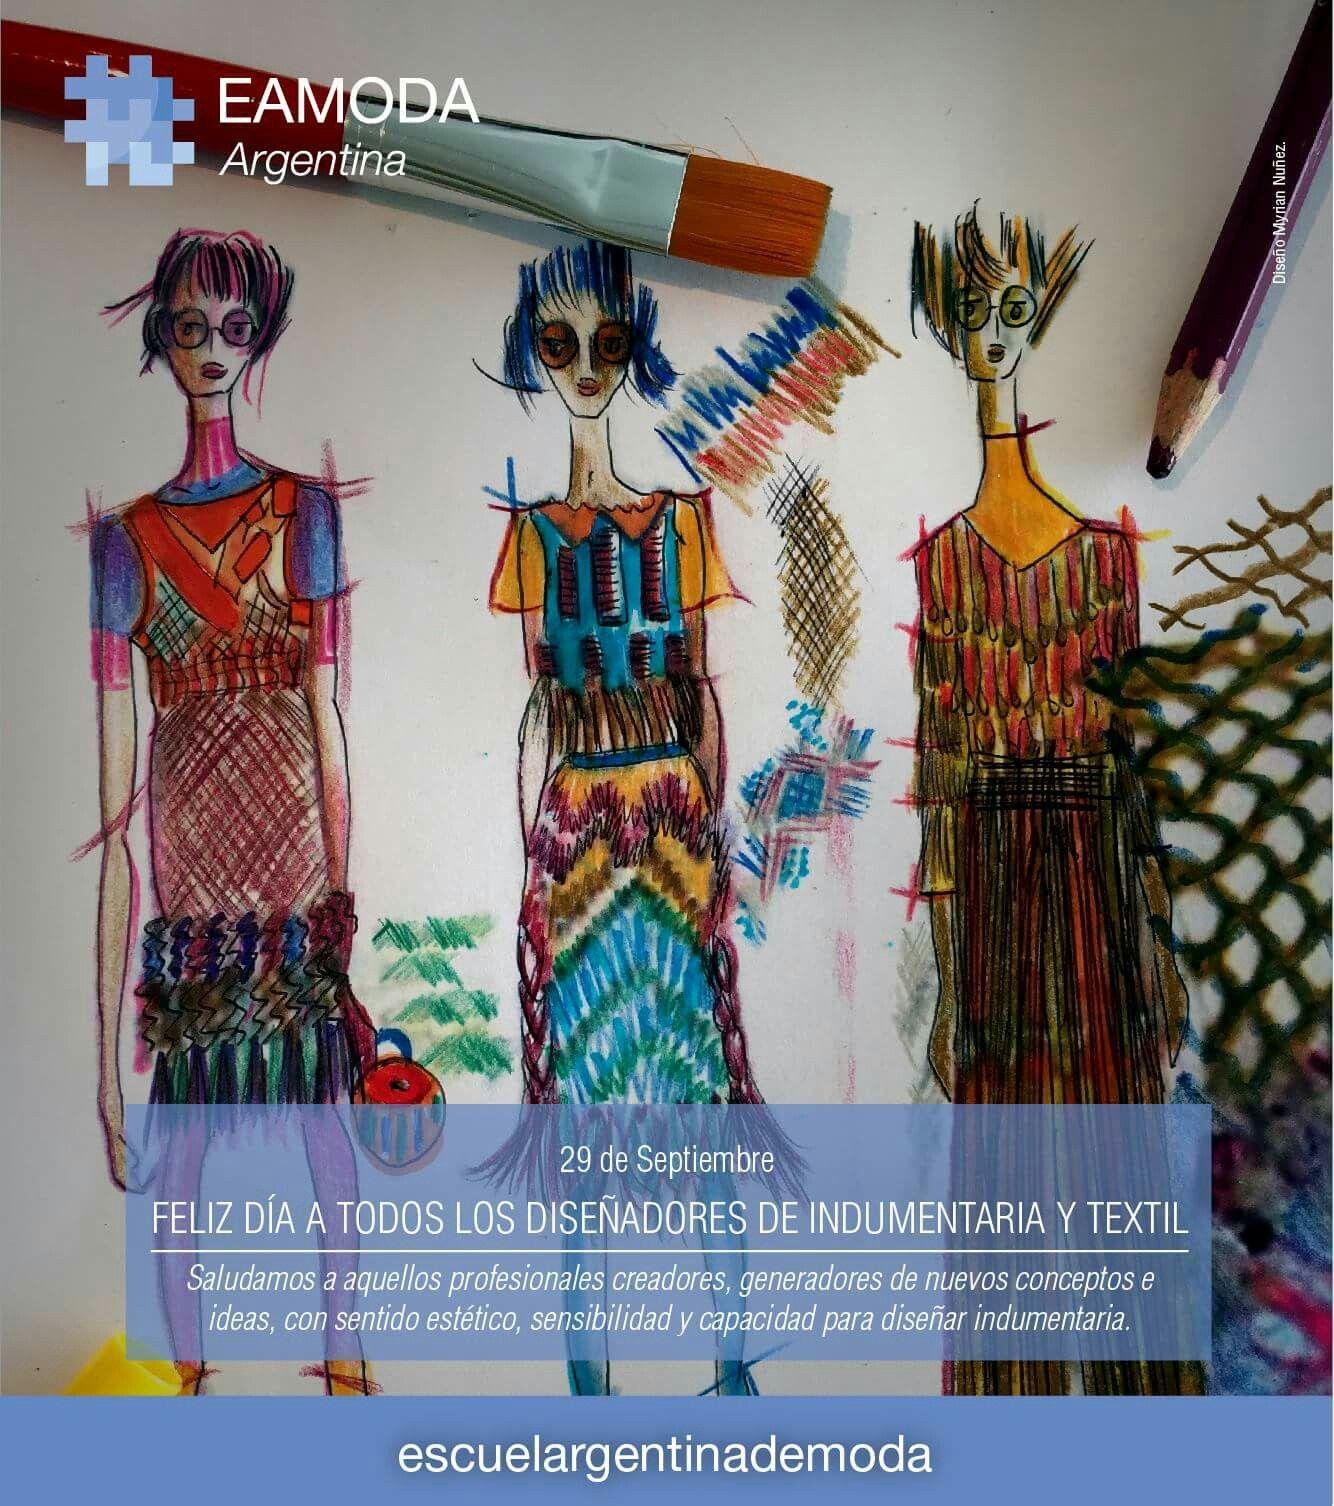 D a del dise ador de indumentaria dise o de indumentaria for Escuela argentina de diseno